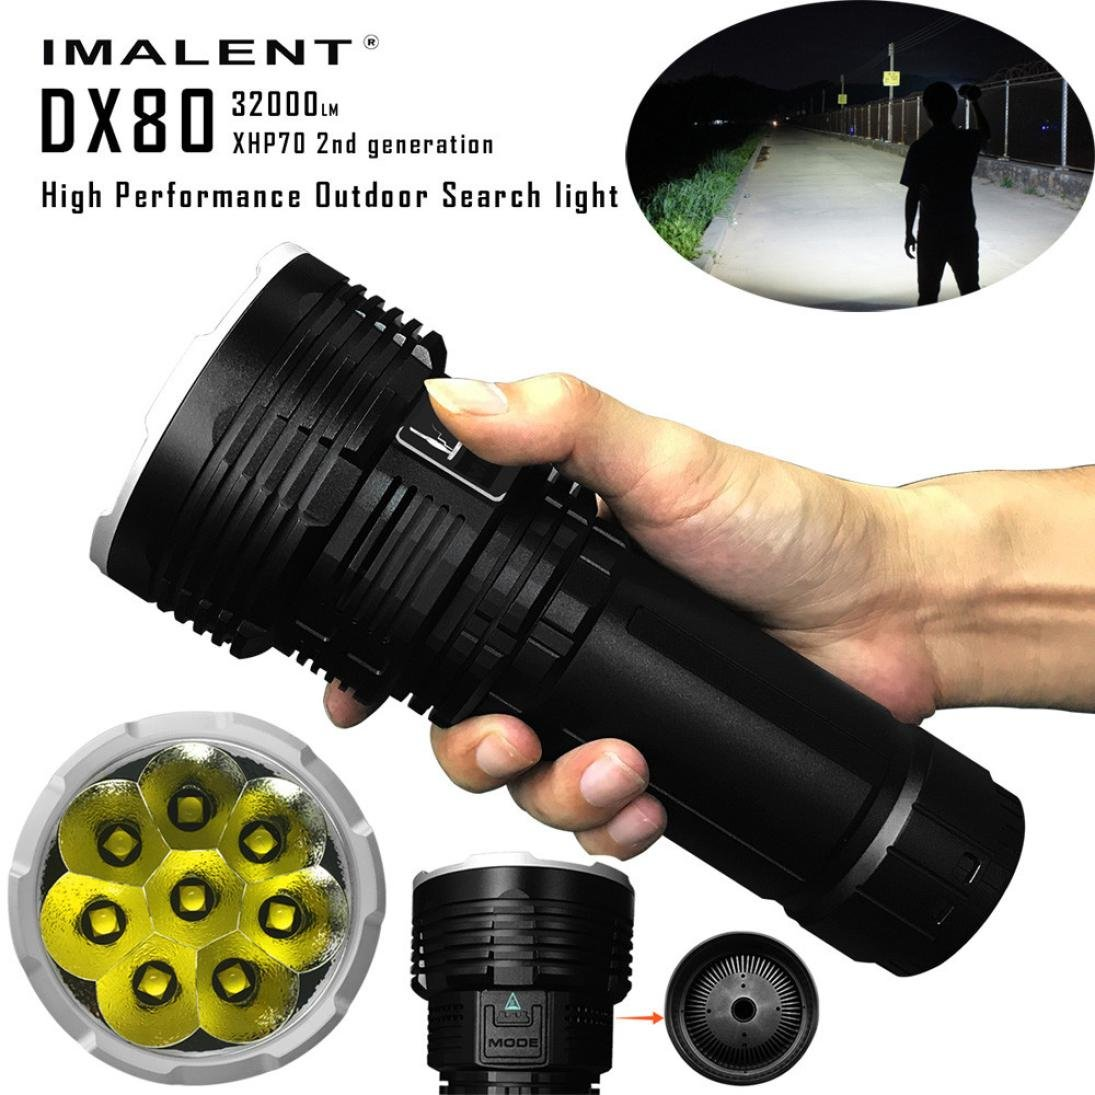 Anshinto Flashlight, IMALENT DX80 XHP70 LED Most Powerful Flood LED seach Flashlight